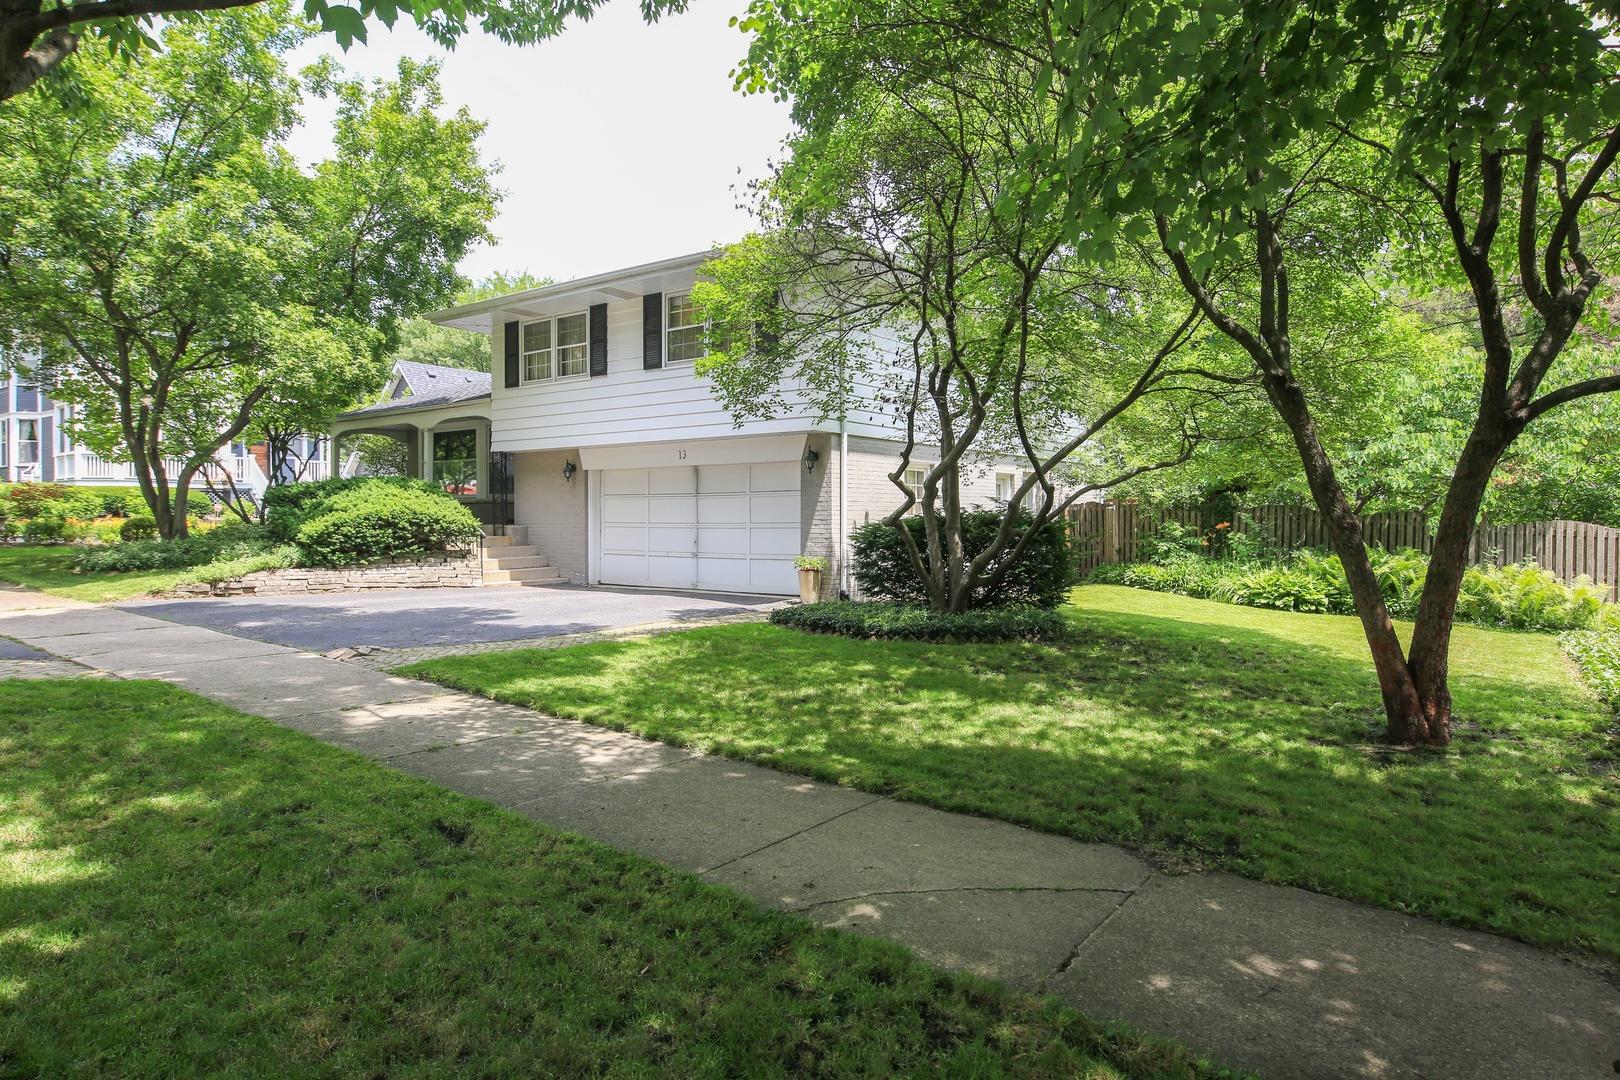 13 S Elm Street, Hinsdale IL 60521